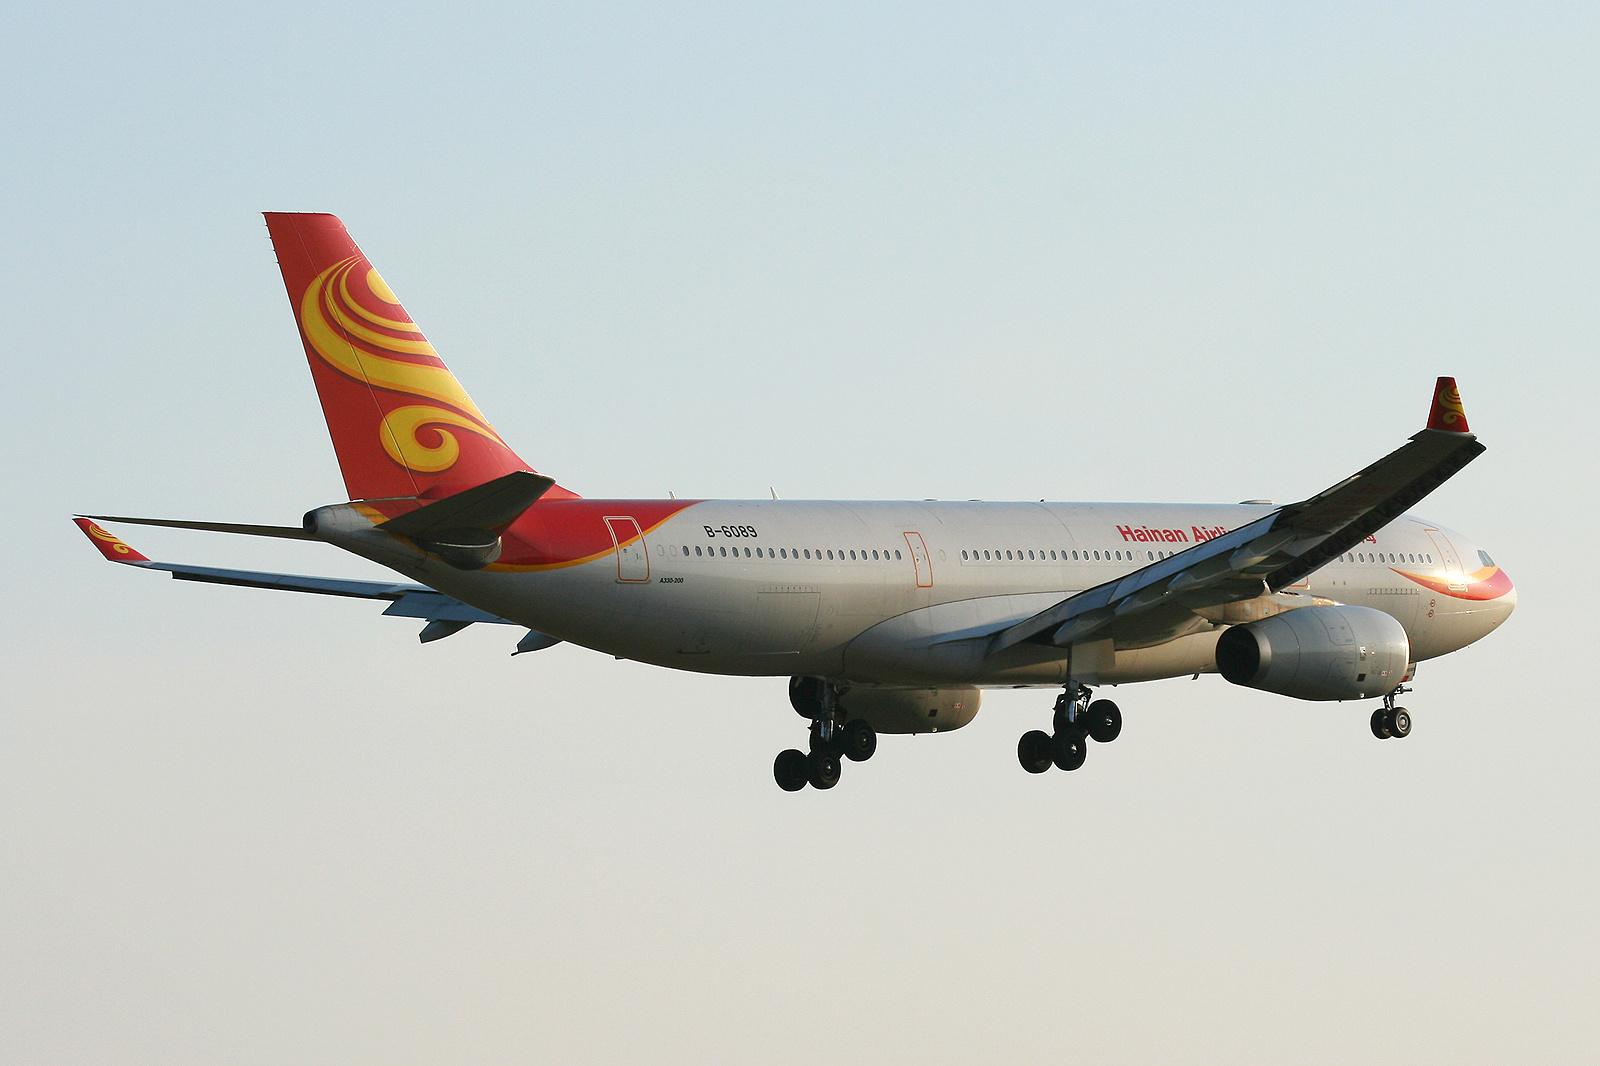 File Hainan Airlines A330-200 B-6089 SVO 2009-4-23.png - Wikimedia ... 6bcfc0bd07dc5